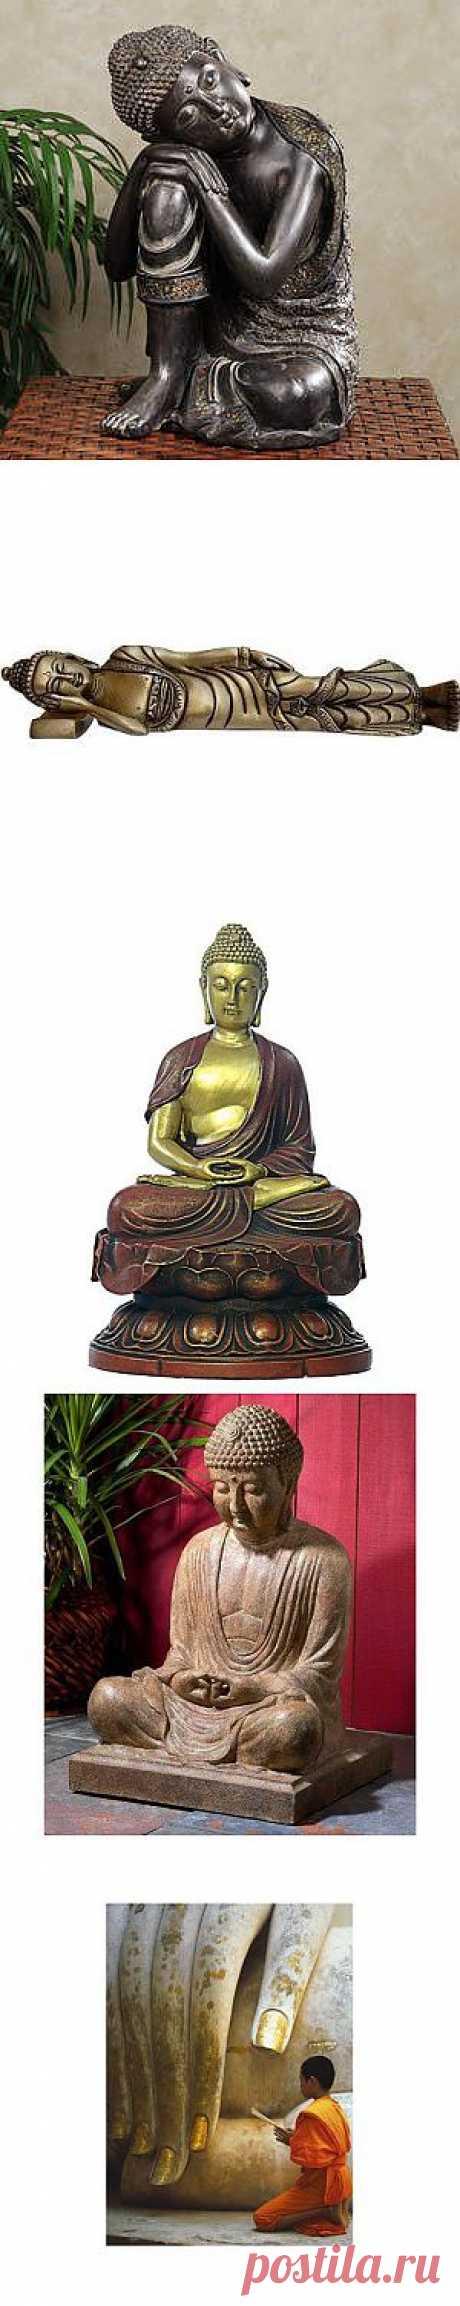 Будда и его лики | Ветер и Вода